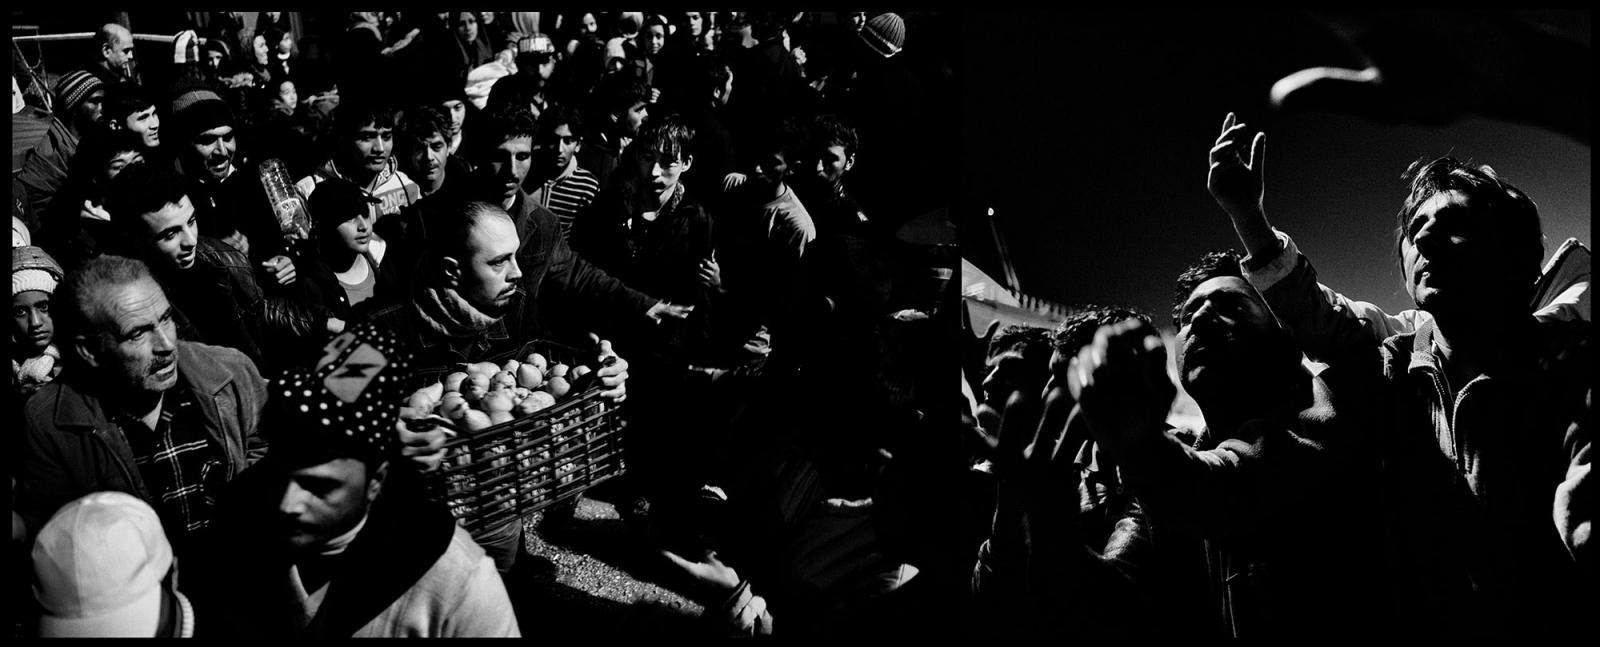 Art and Documentary Photography - Loading Nikos_Pilos_Stern_Goethe_institute_007.jpg